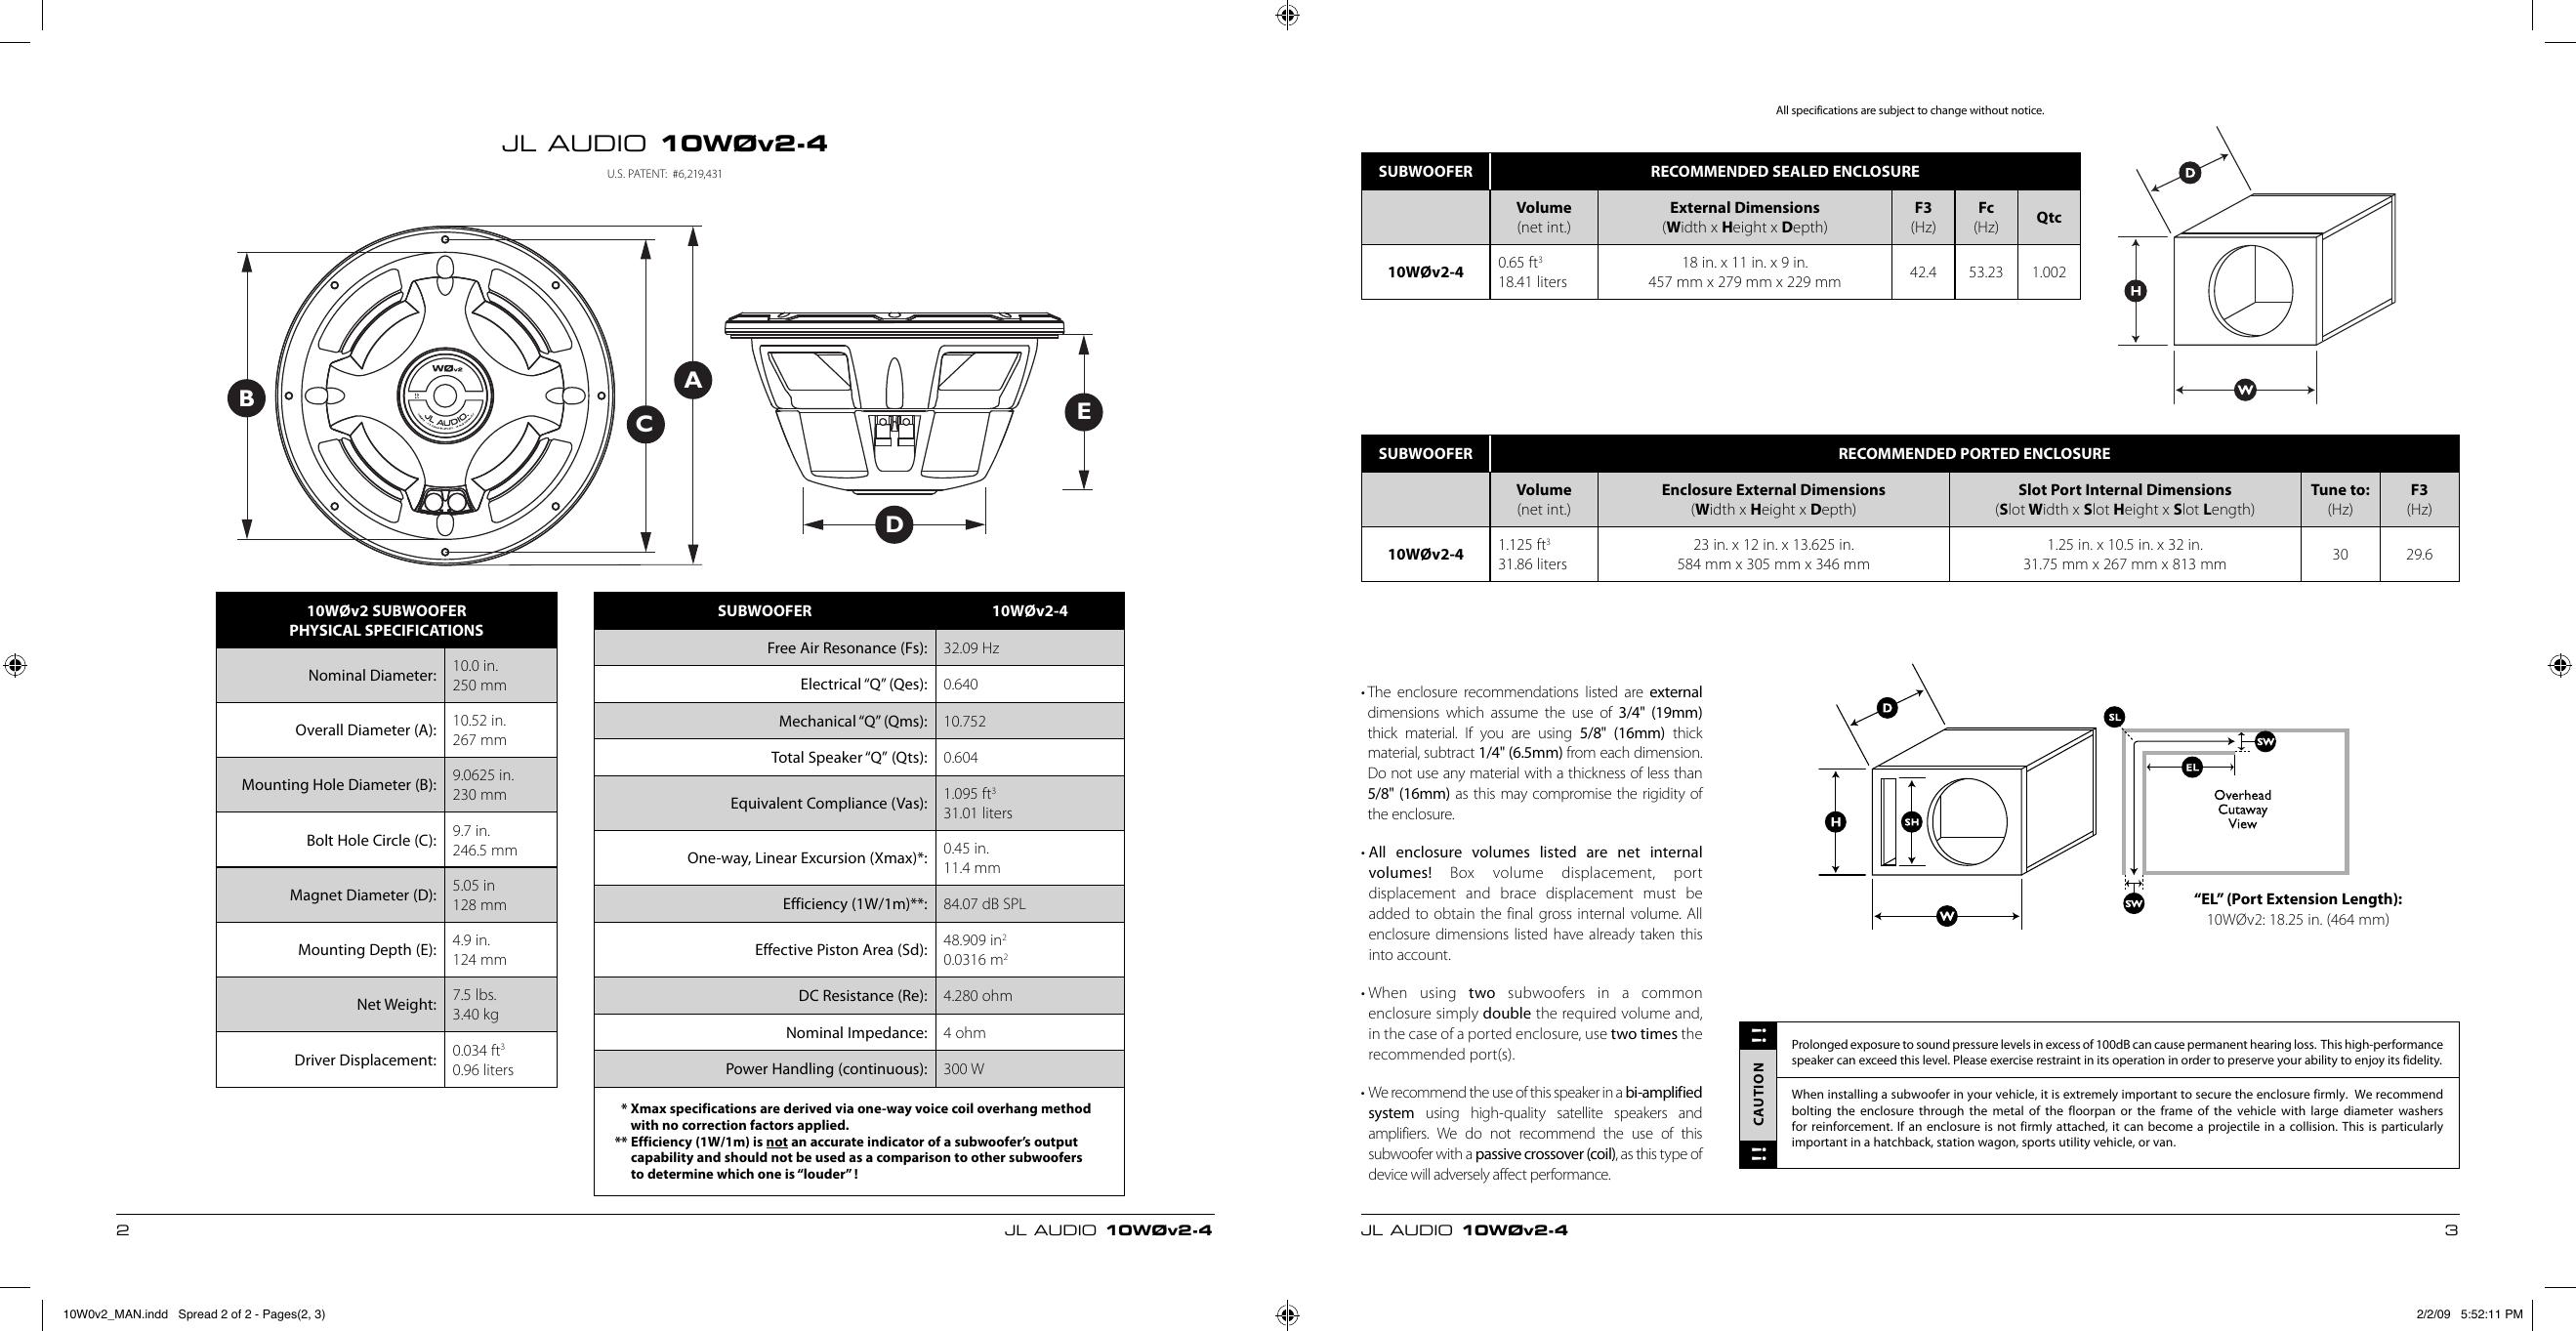 Jl Audio 10W0V2 4 Users Manual 10W0v2_MAN